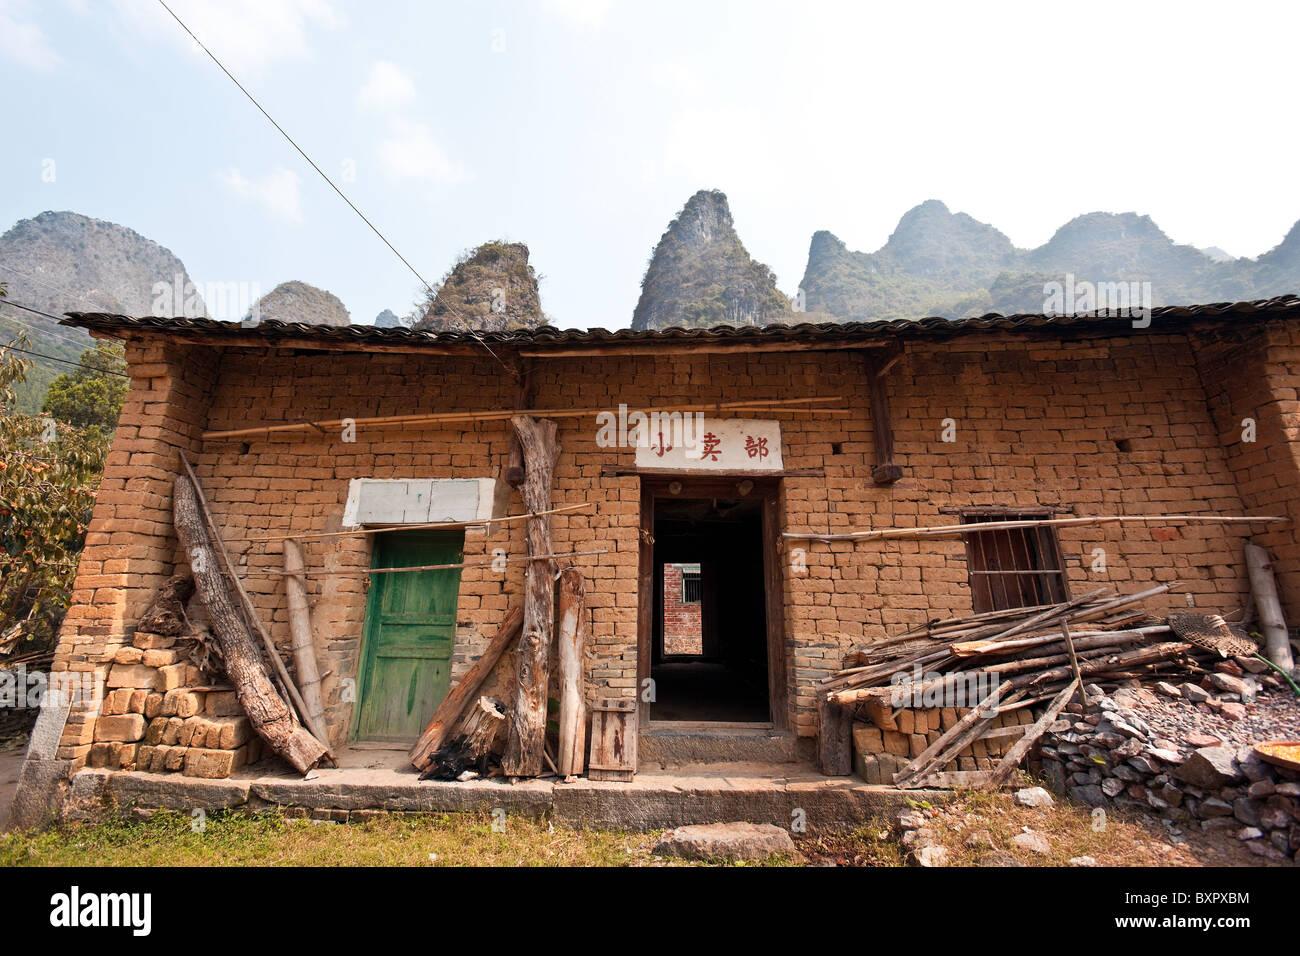 China, Guangxi Province, Yangshuo. Local house. Stock Photo